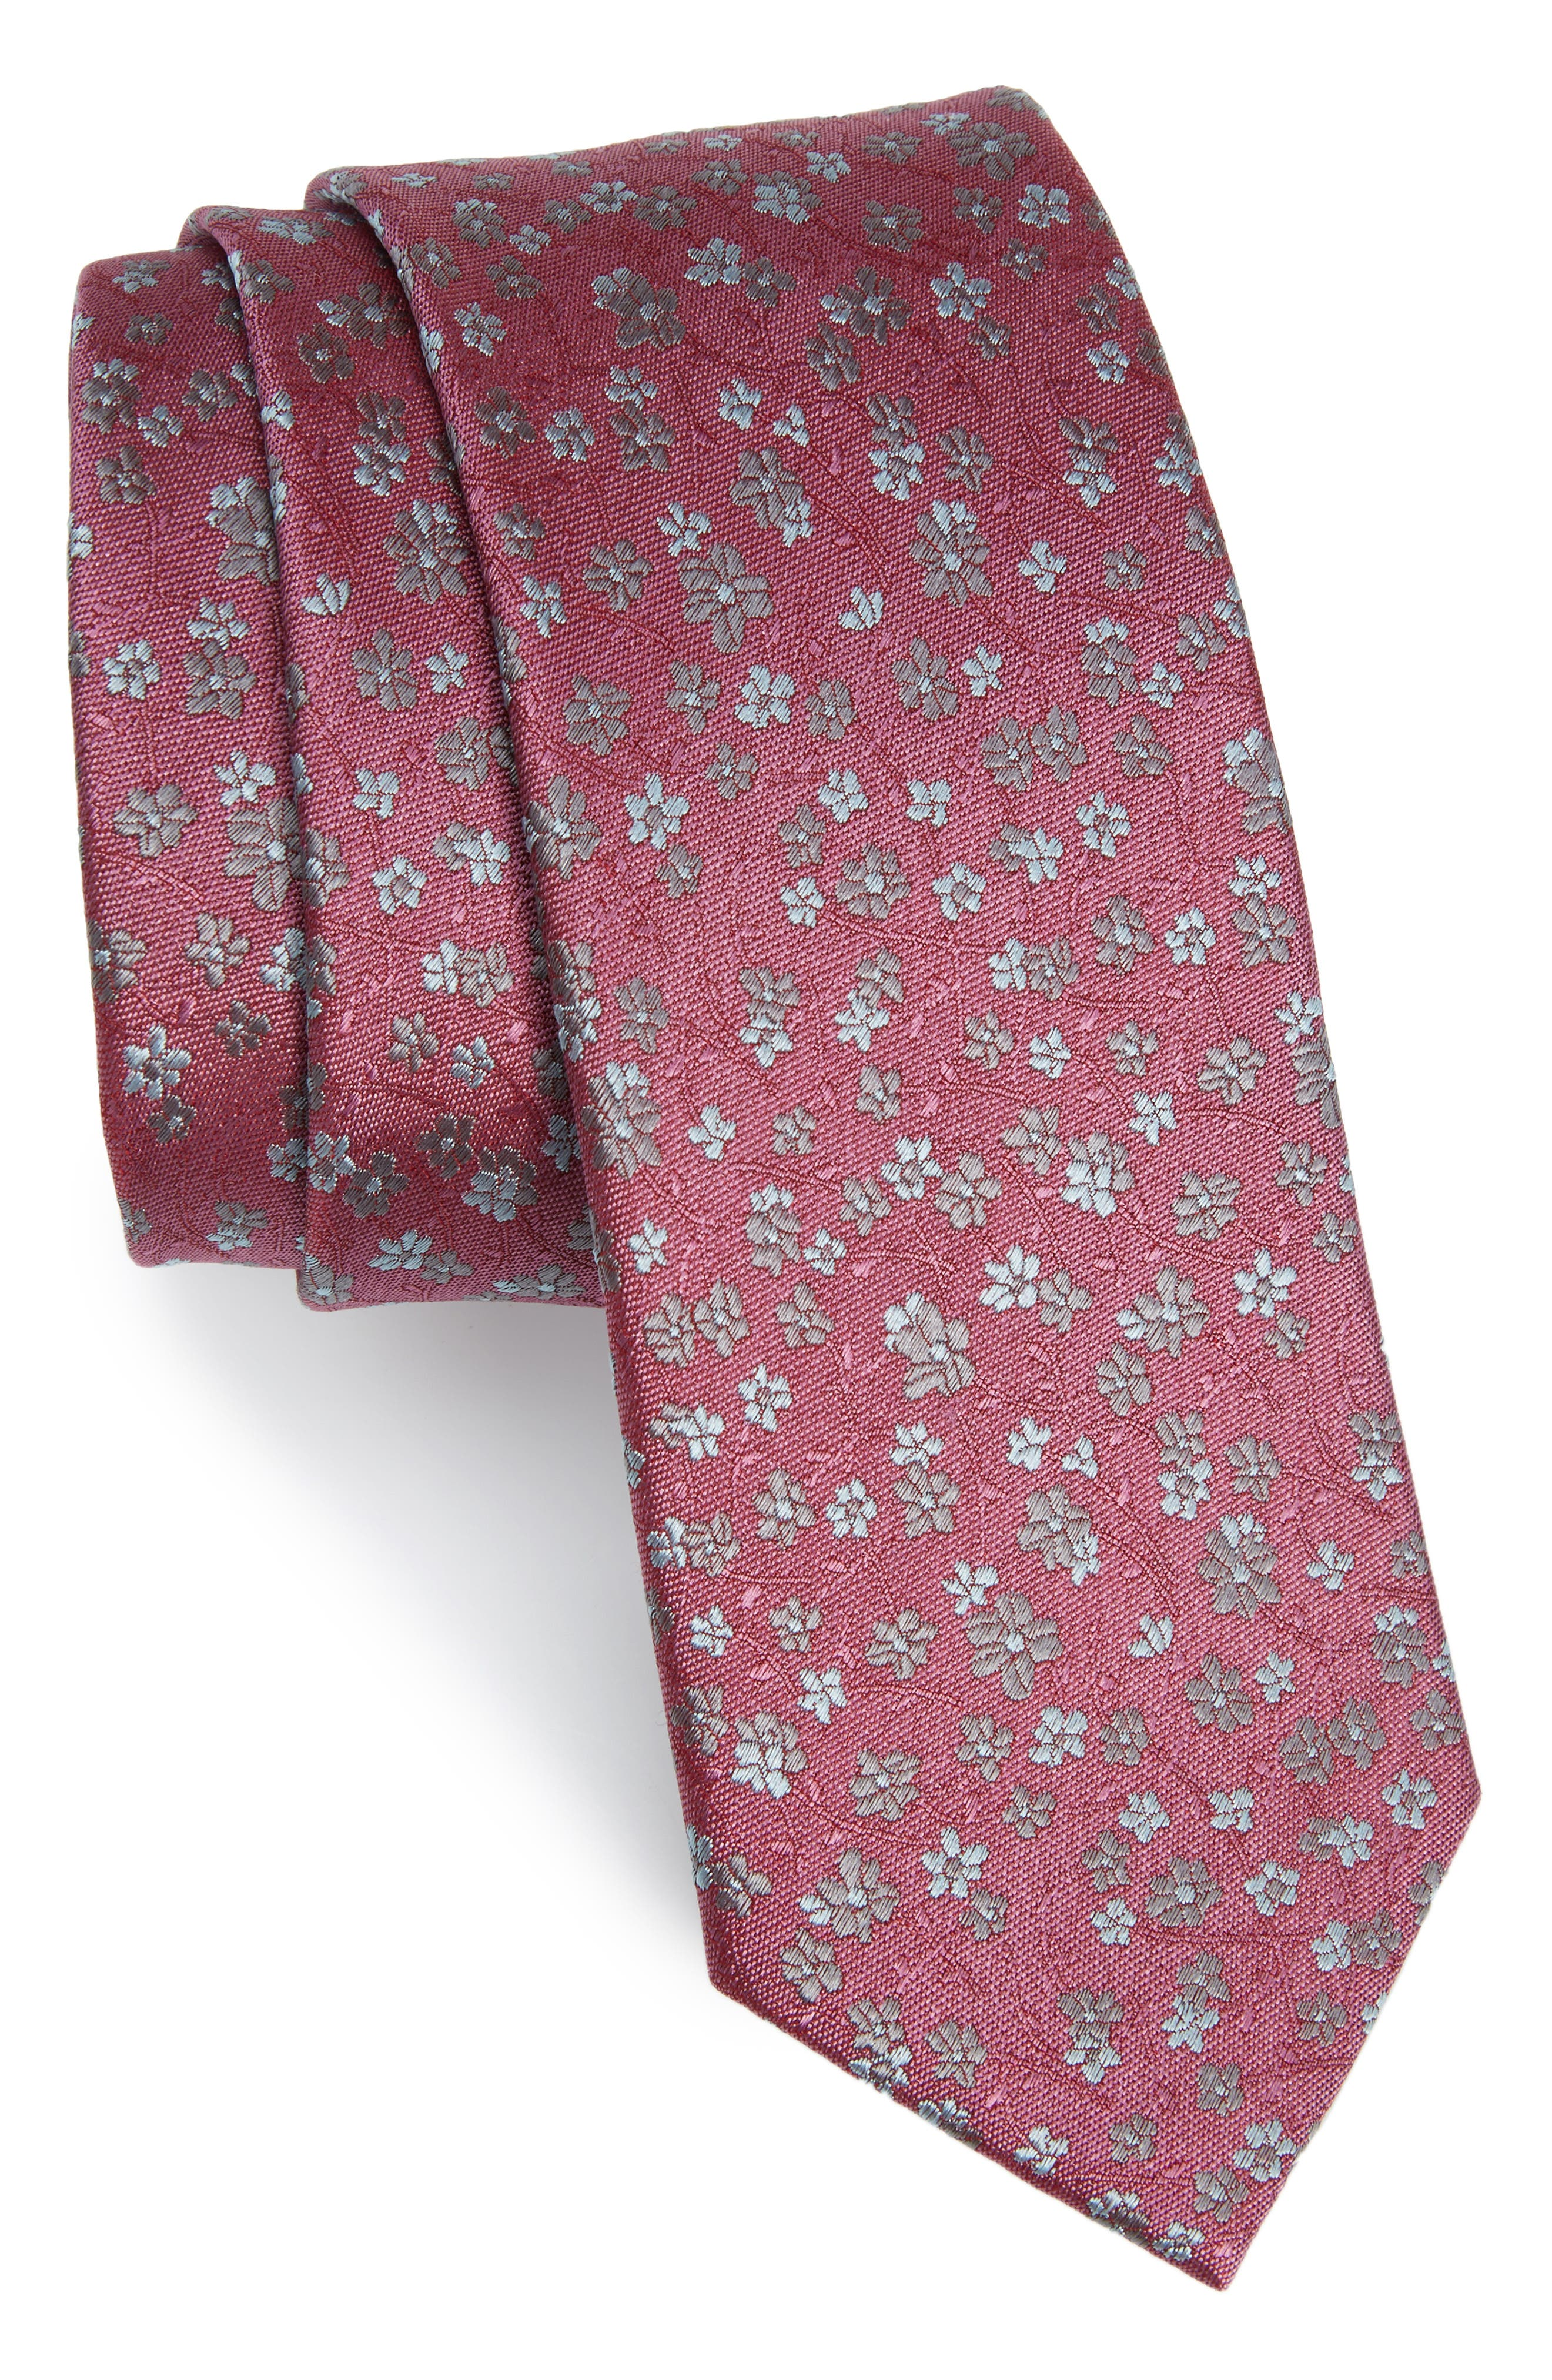 The Tie Bar Freefall Floral Silk Tie